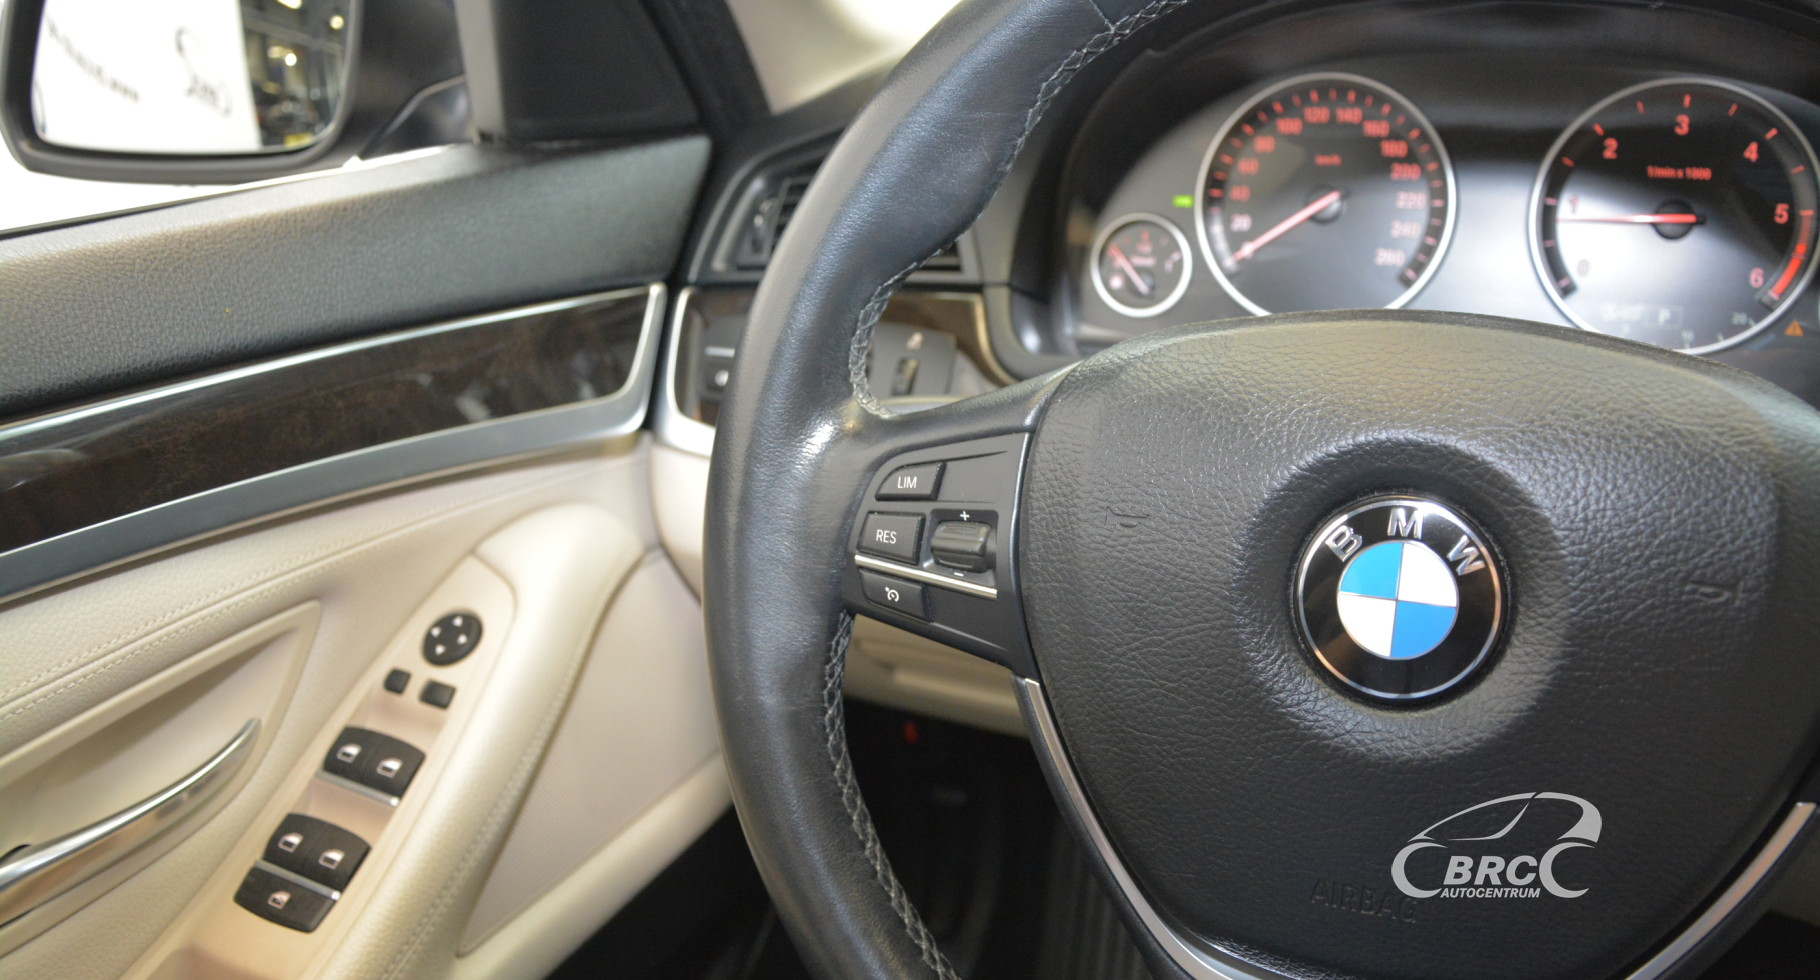 BMW 518 d Automatas